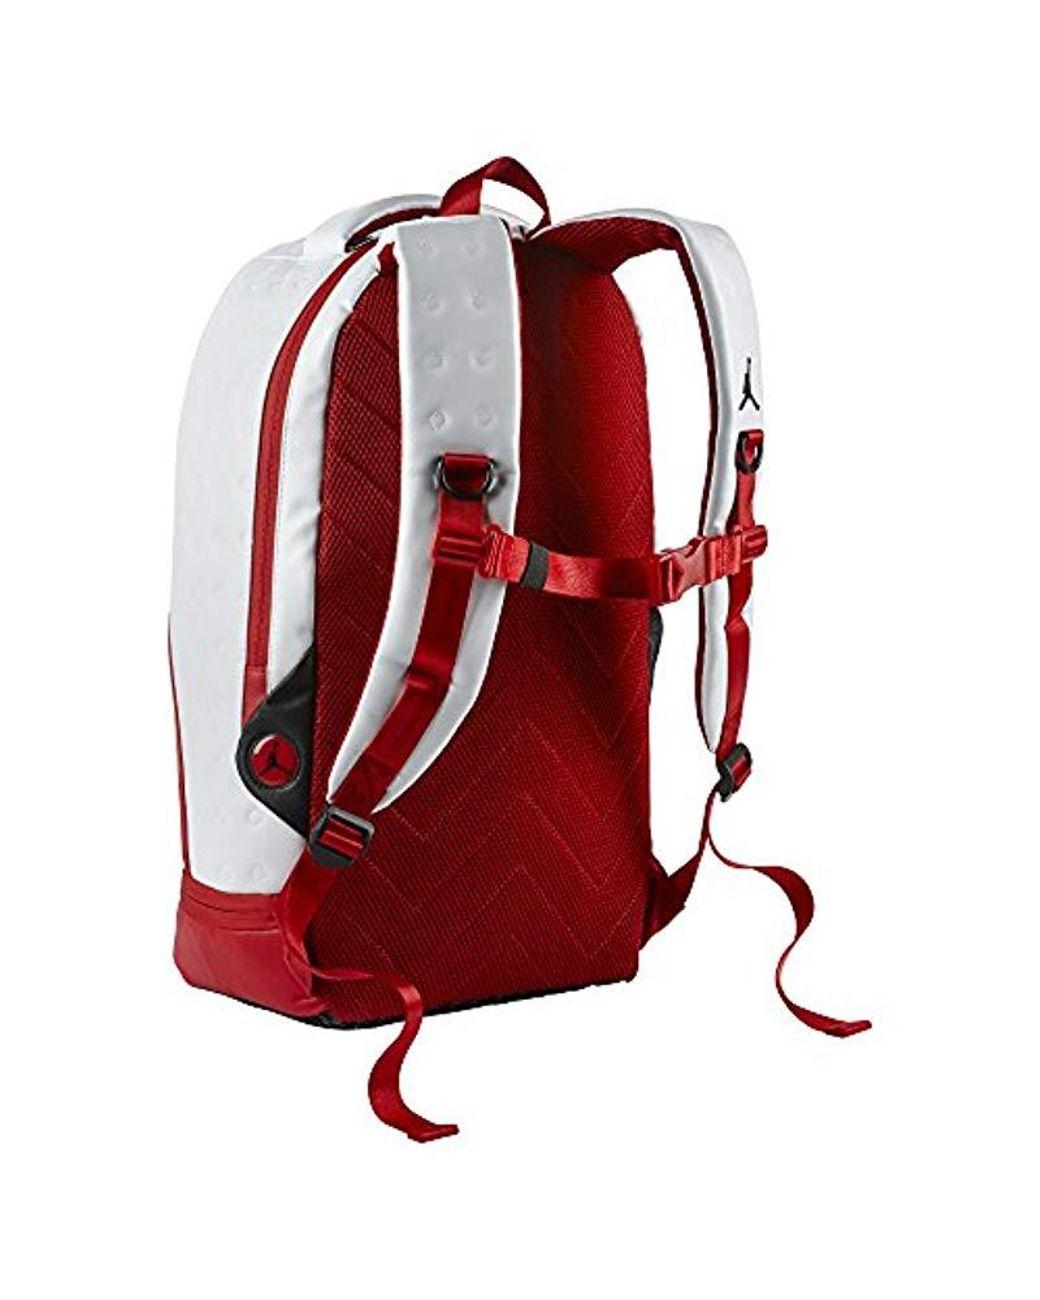 timeless design 66a23 56865 Nike Jordan Retro 13 Backpack in Red - Lyst